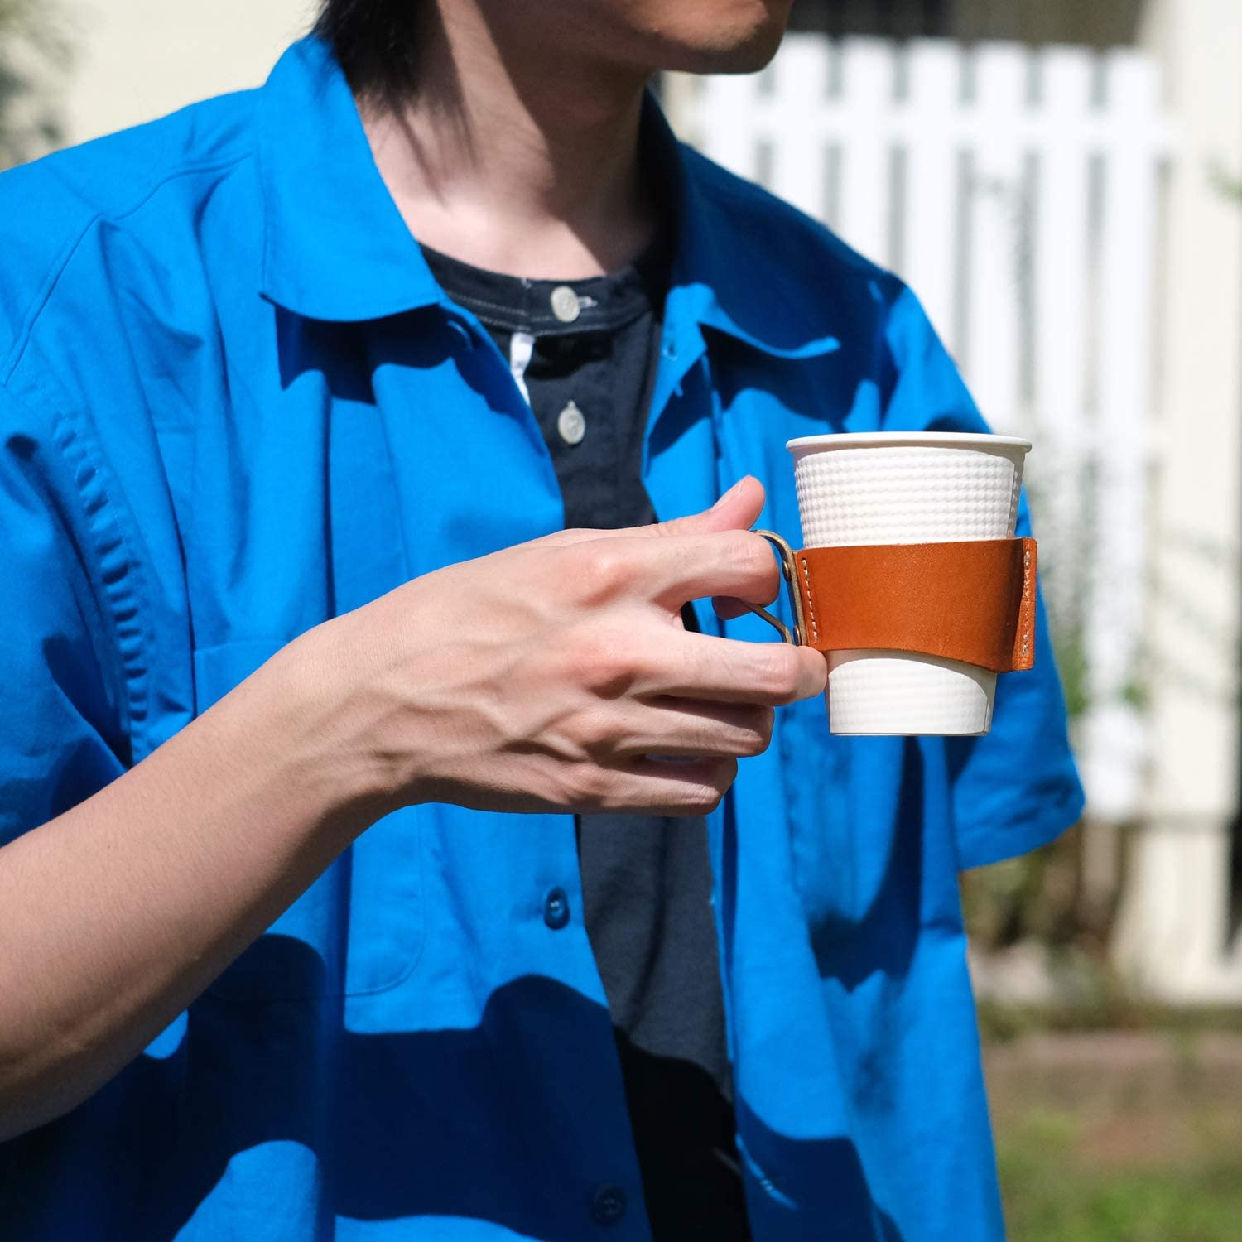 clife(クリフ)coffee and life コーヒースリーブの商品画像4